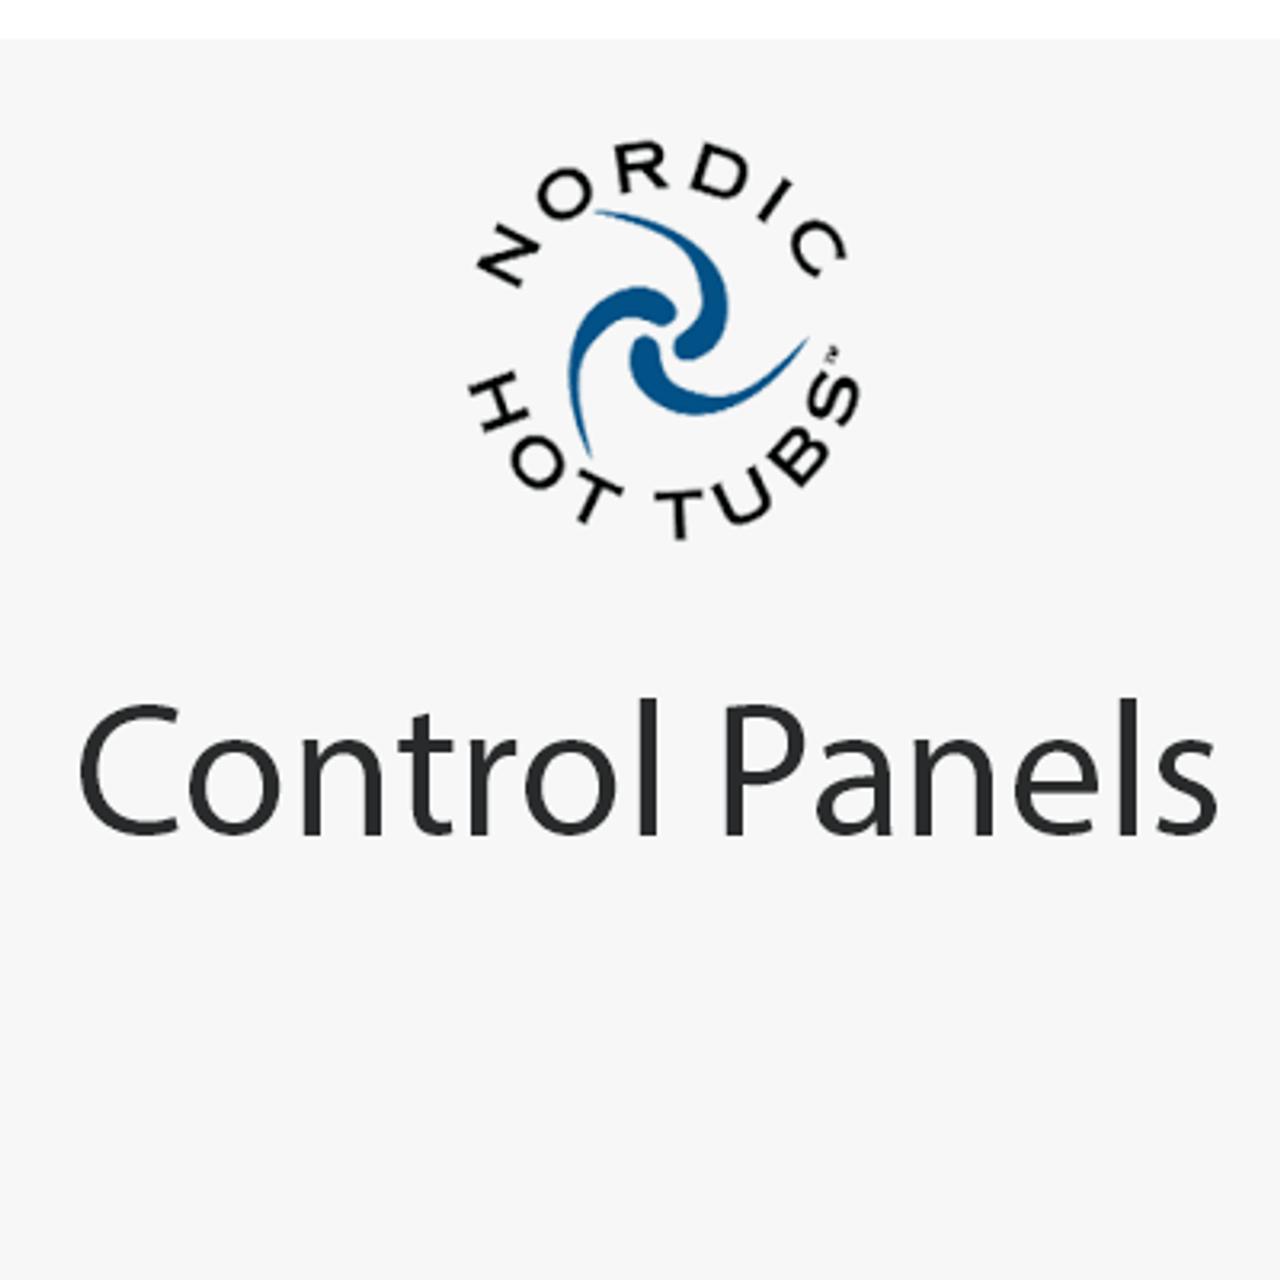 Nordic Control Panels